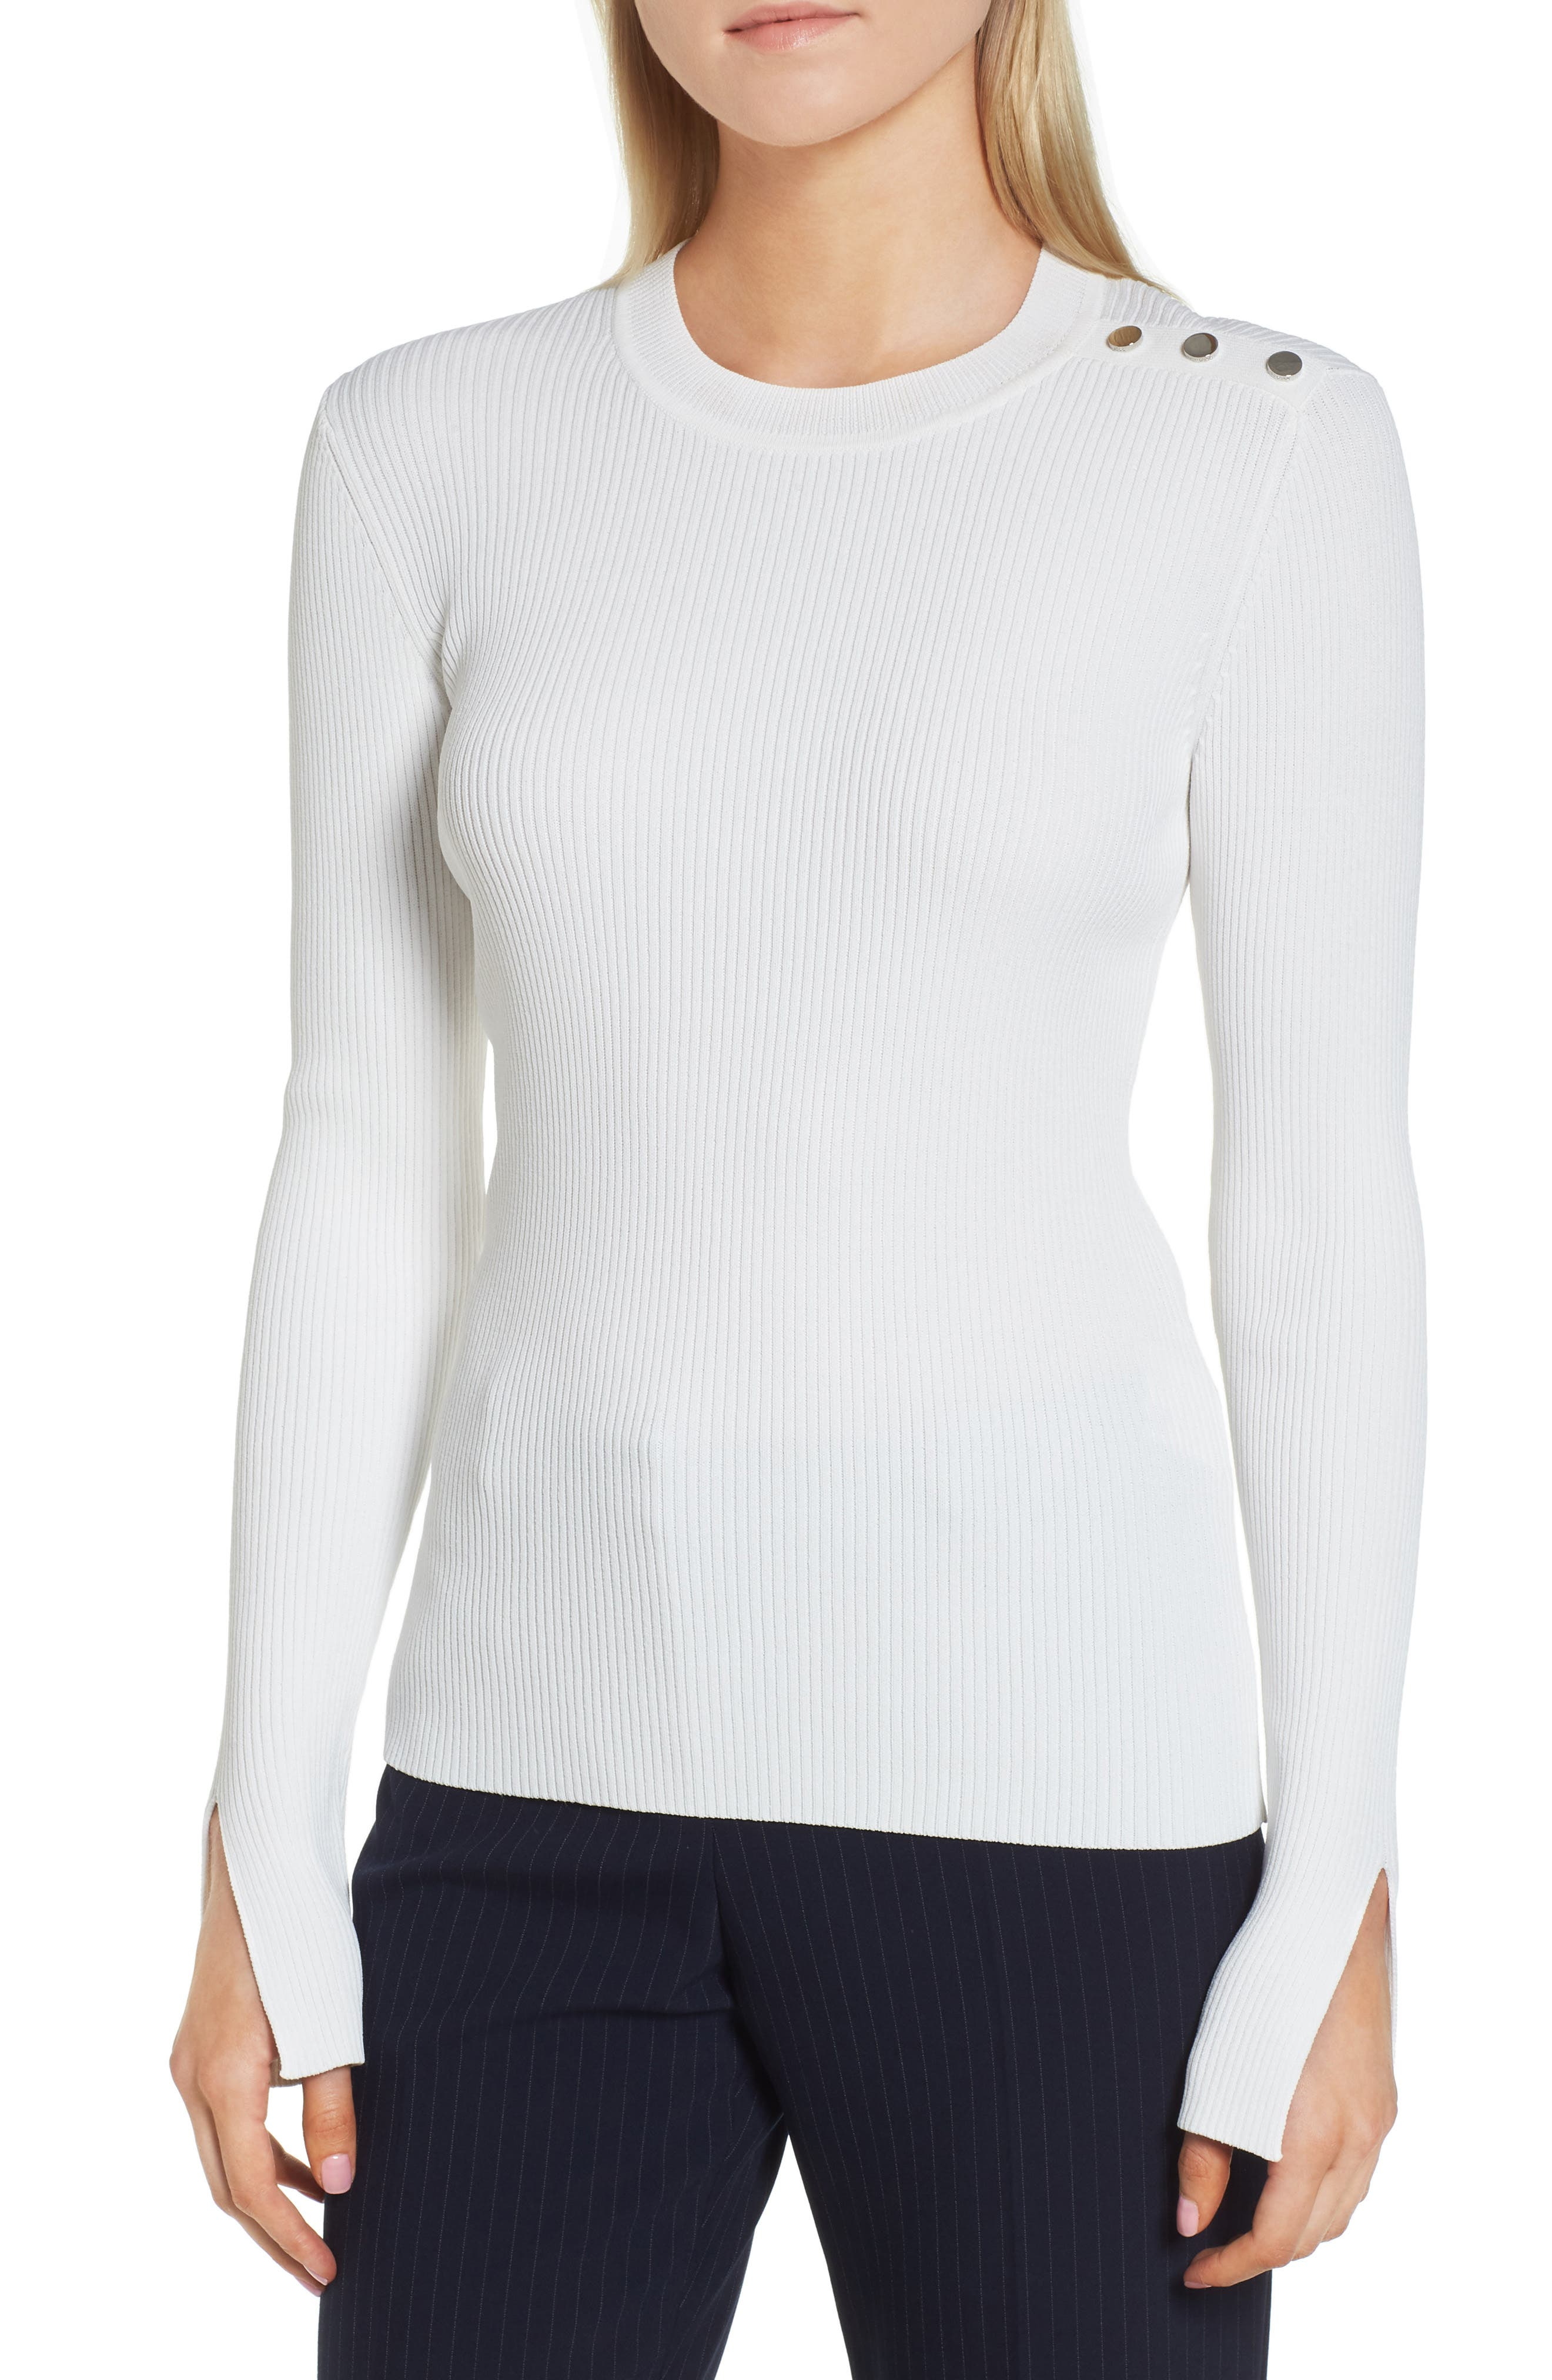 Fangeli Sweater,                         Main,                         color, Vanilla Light